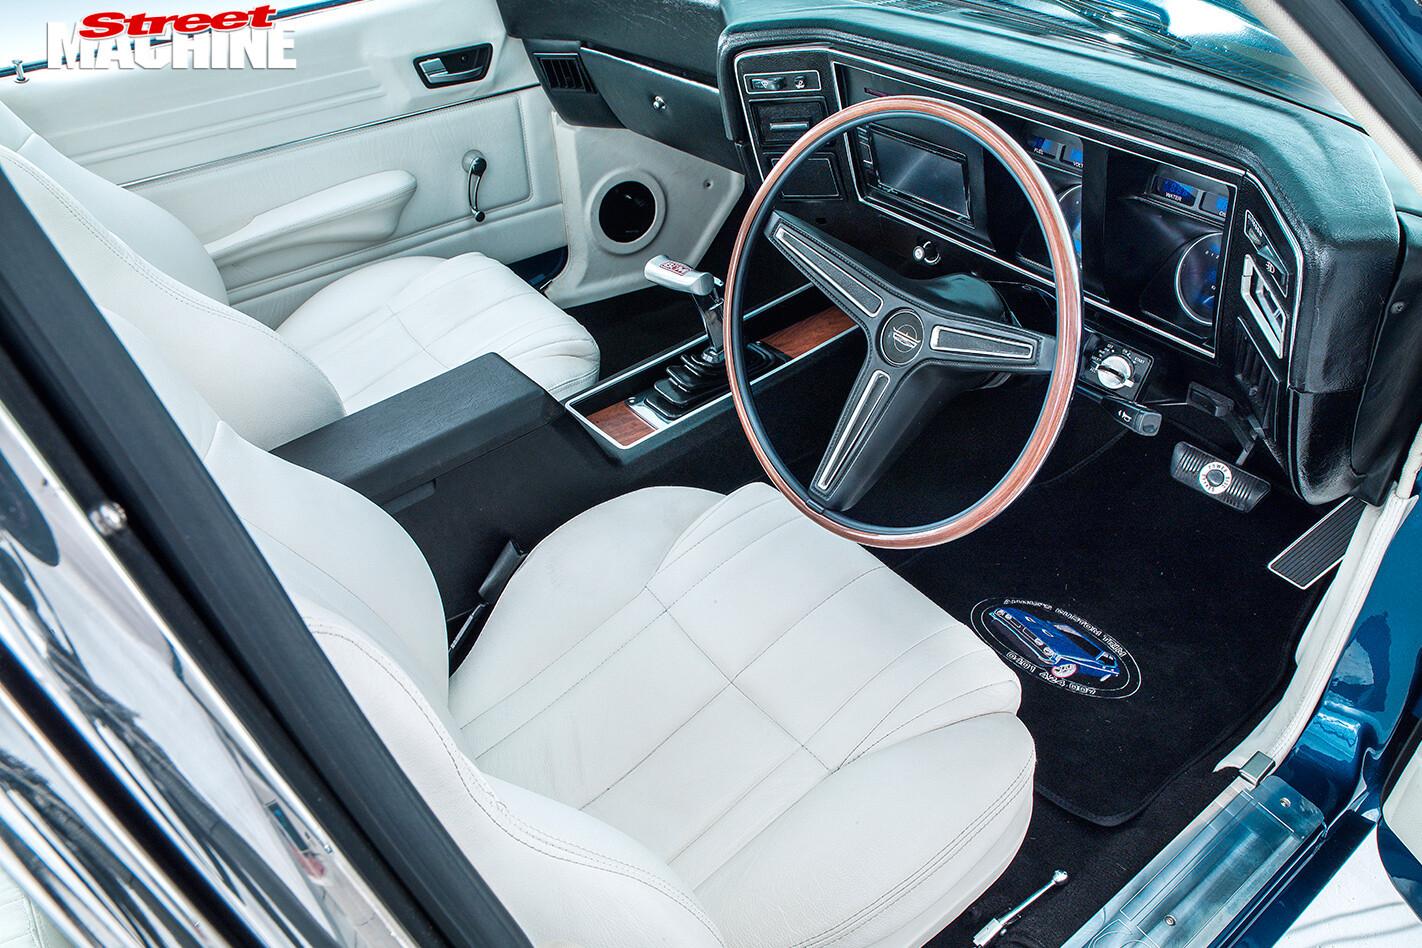 Ford -XB-Falcon -Fairmont -GS-interior -front